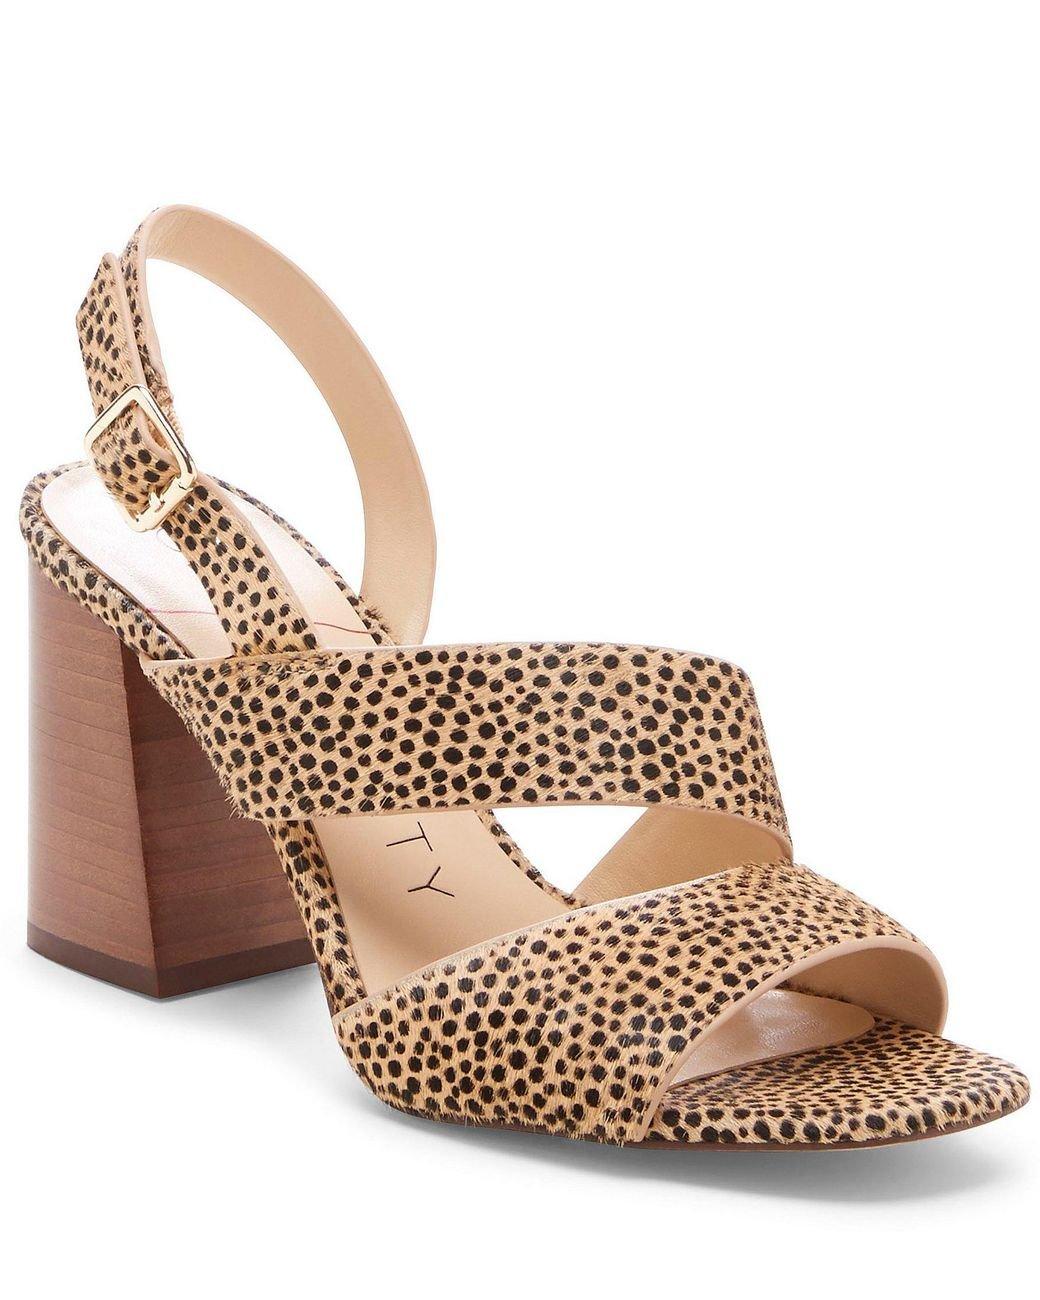 9e10456af33 Sole Society. Women s Jiya Dotted Calf Hair Block Heel Sandals